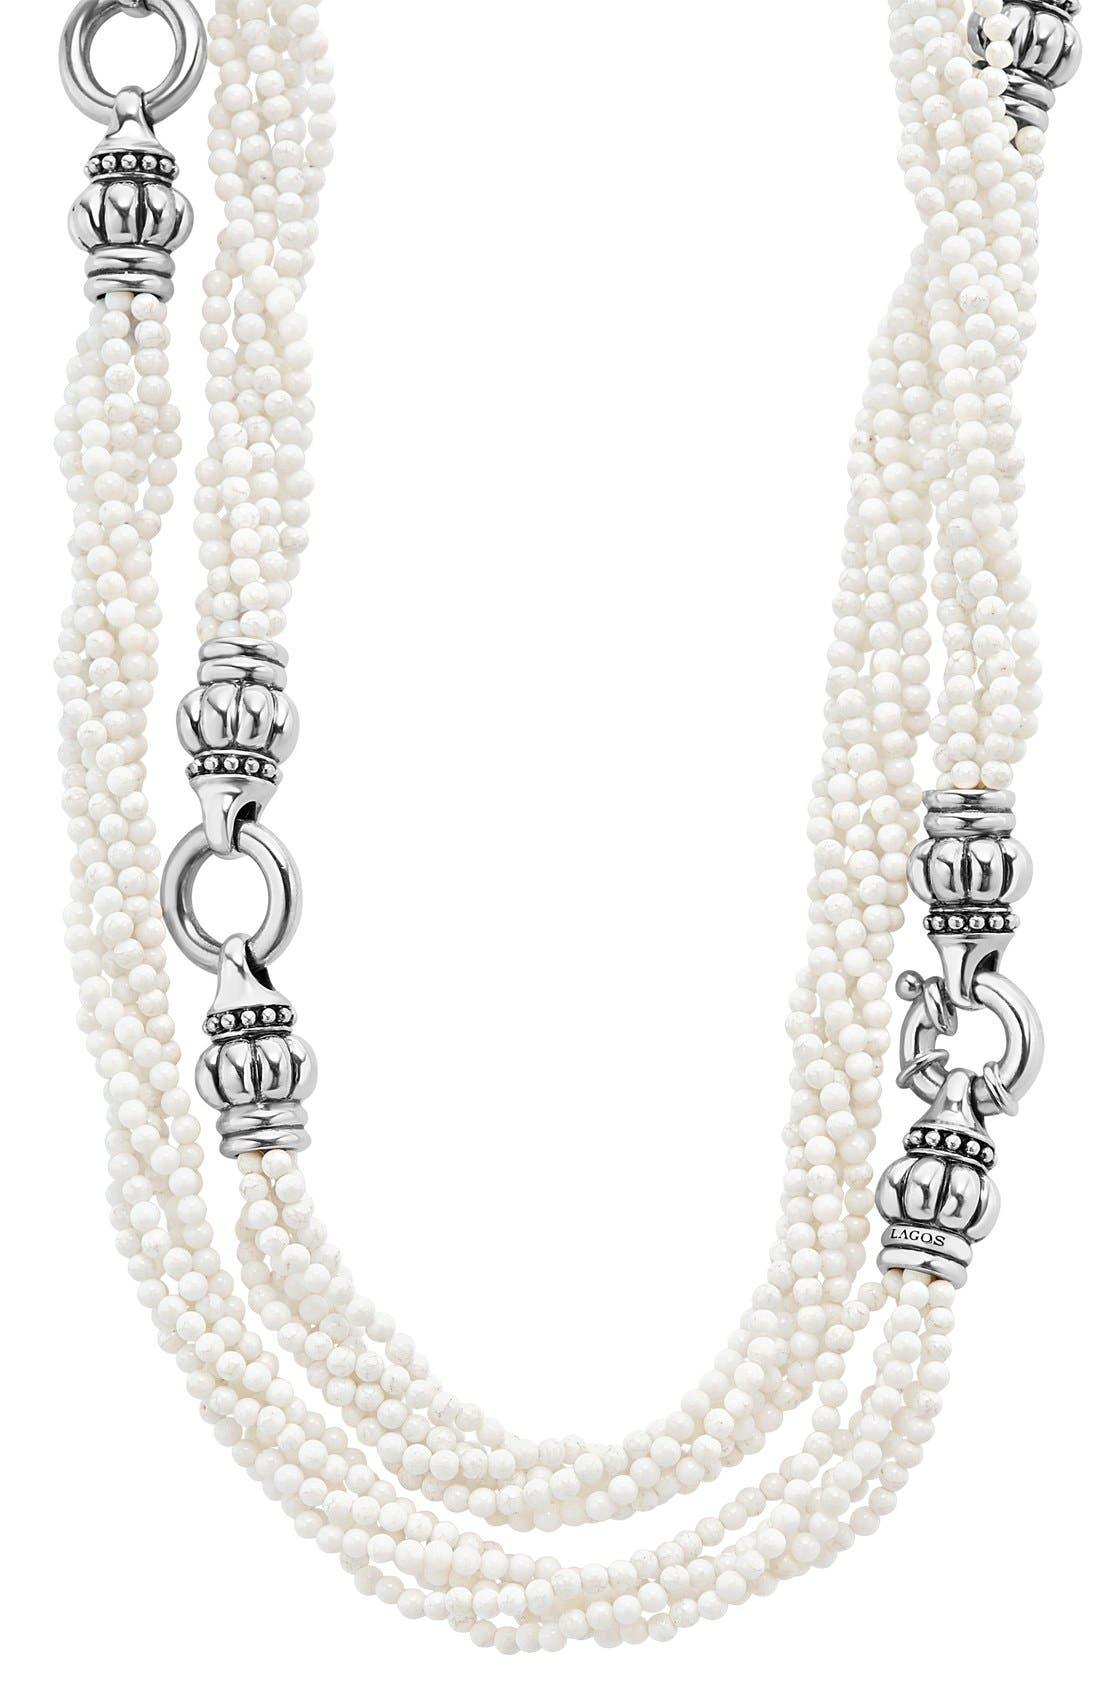 'Black & White Caviar' Agate Multistrand Necklace,                             Alternate thumbnail 3, color,                             101